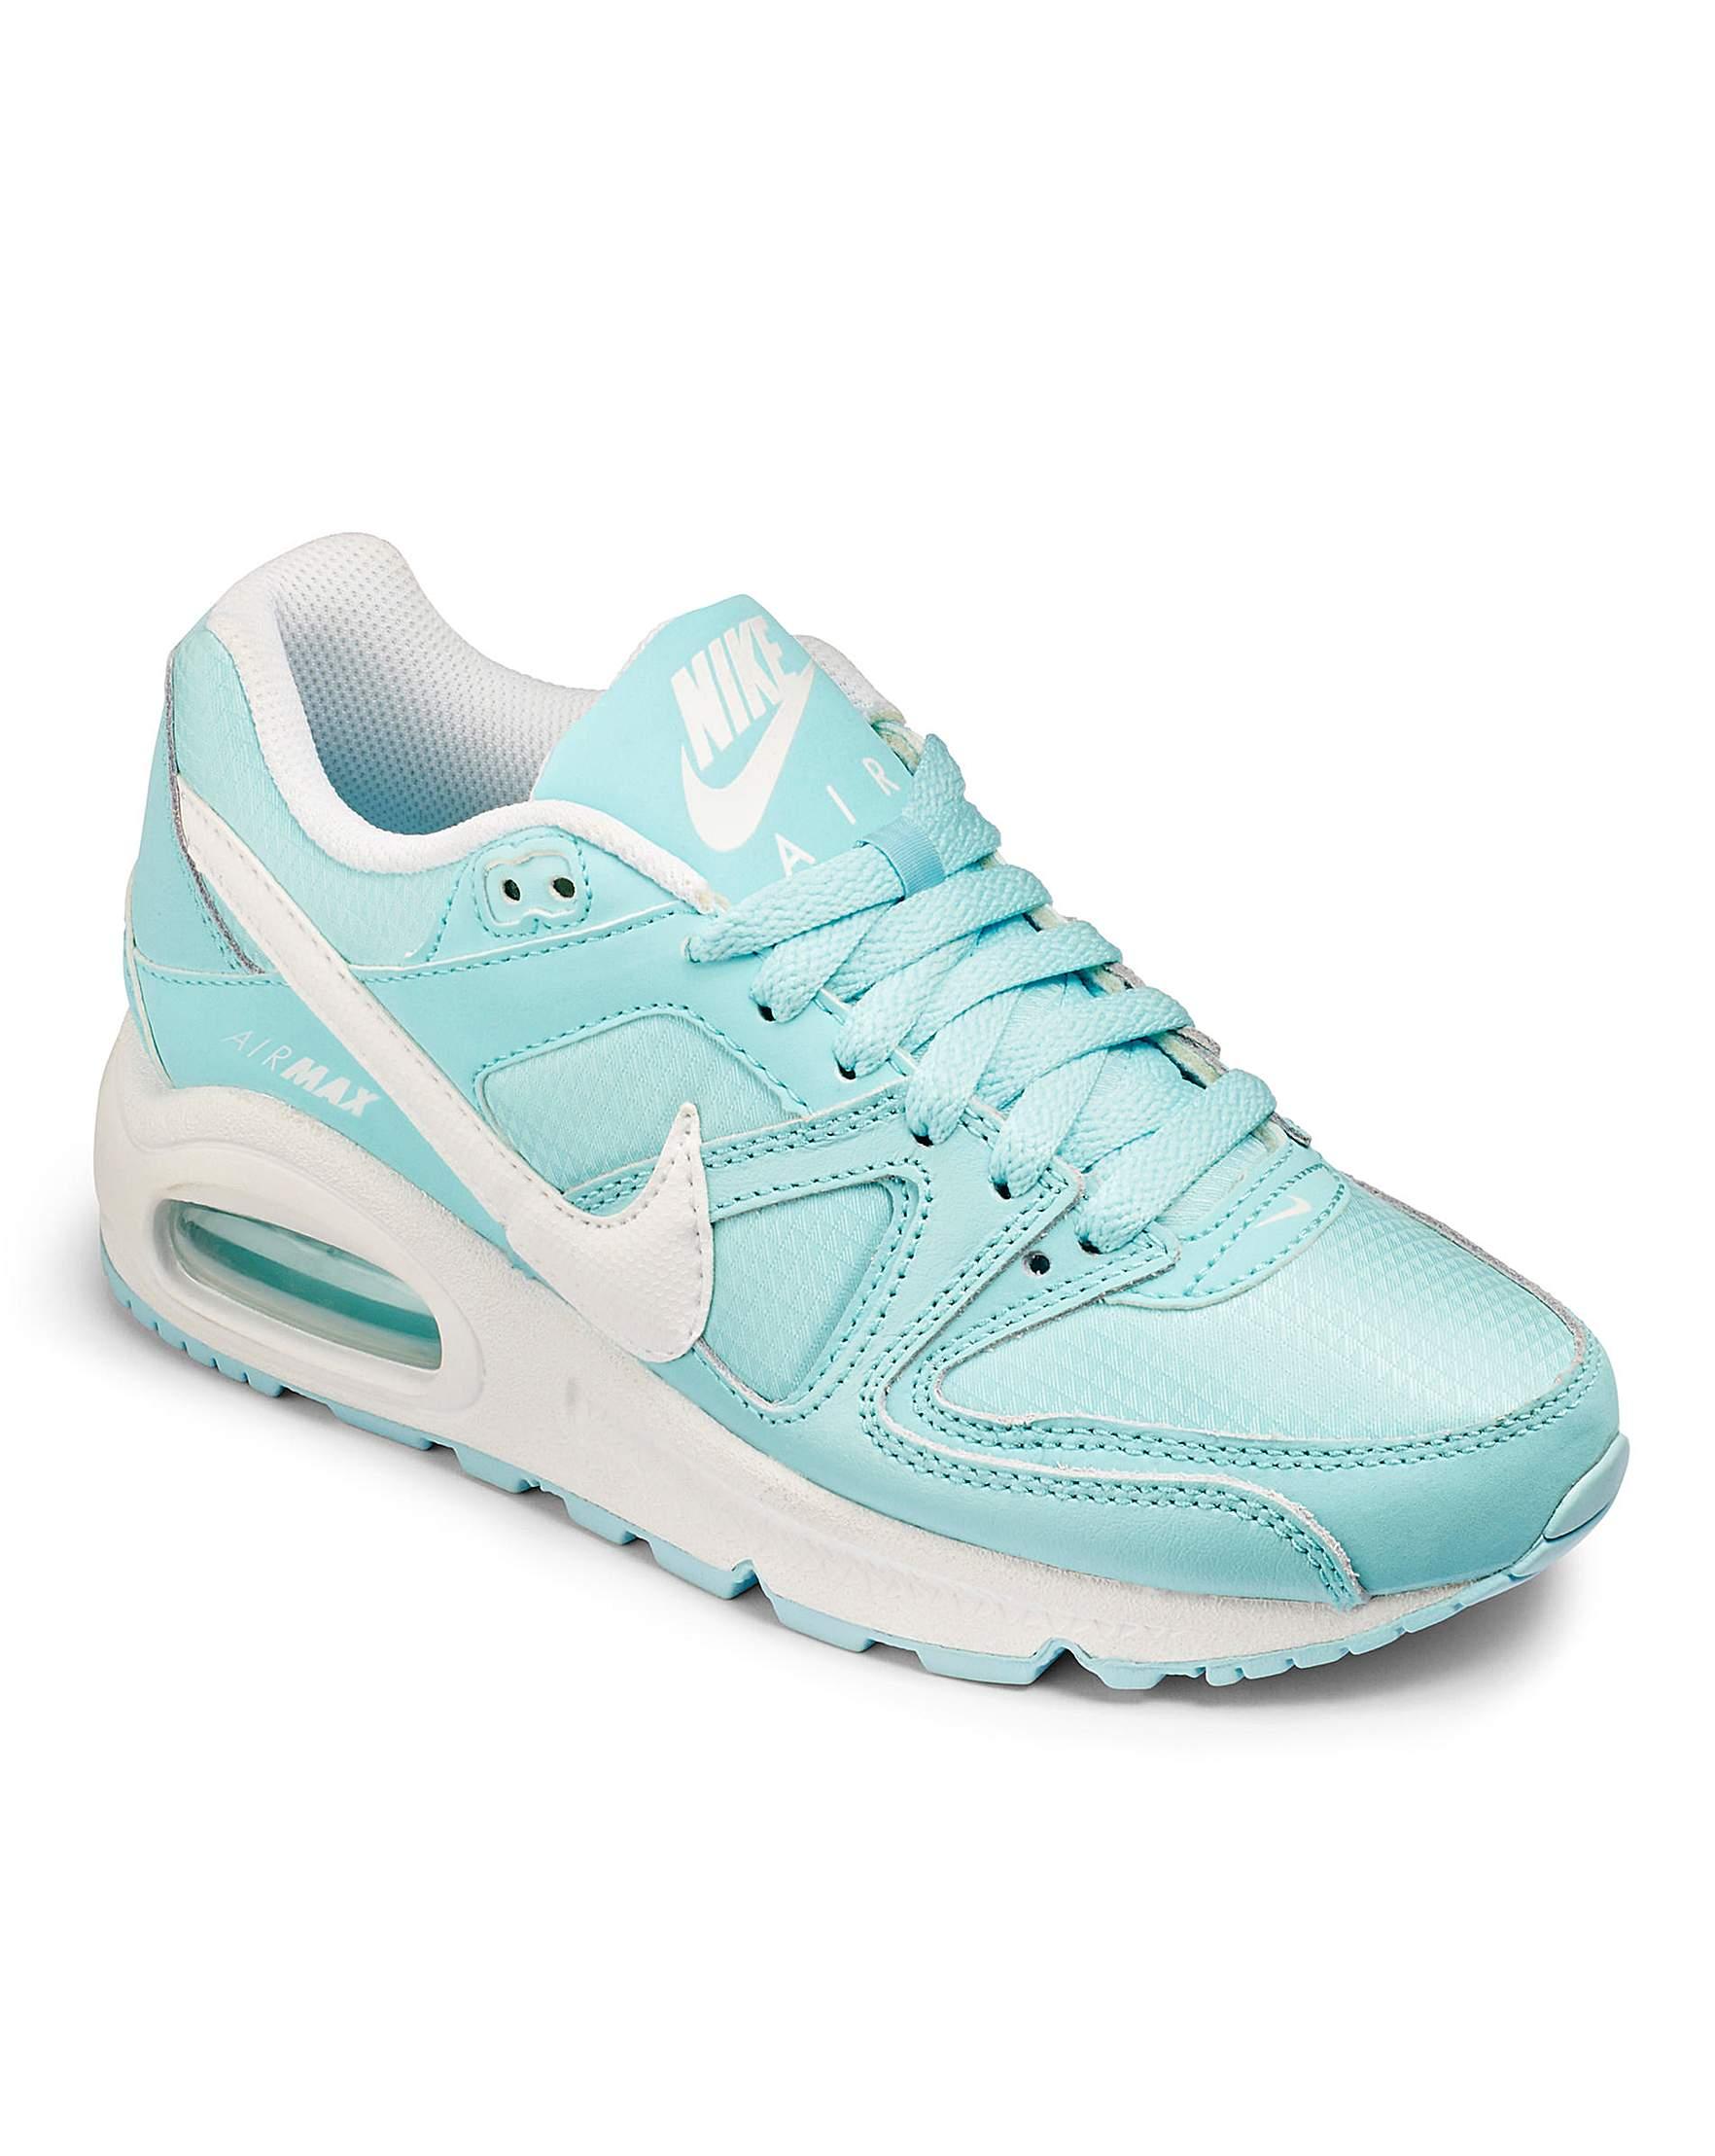 sports shoes 1a15b ae301 ... Nike Girls Air Max Command Jnr Trainers Fashion World ...